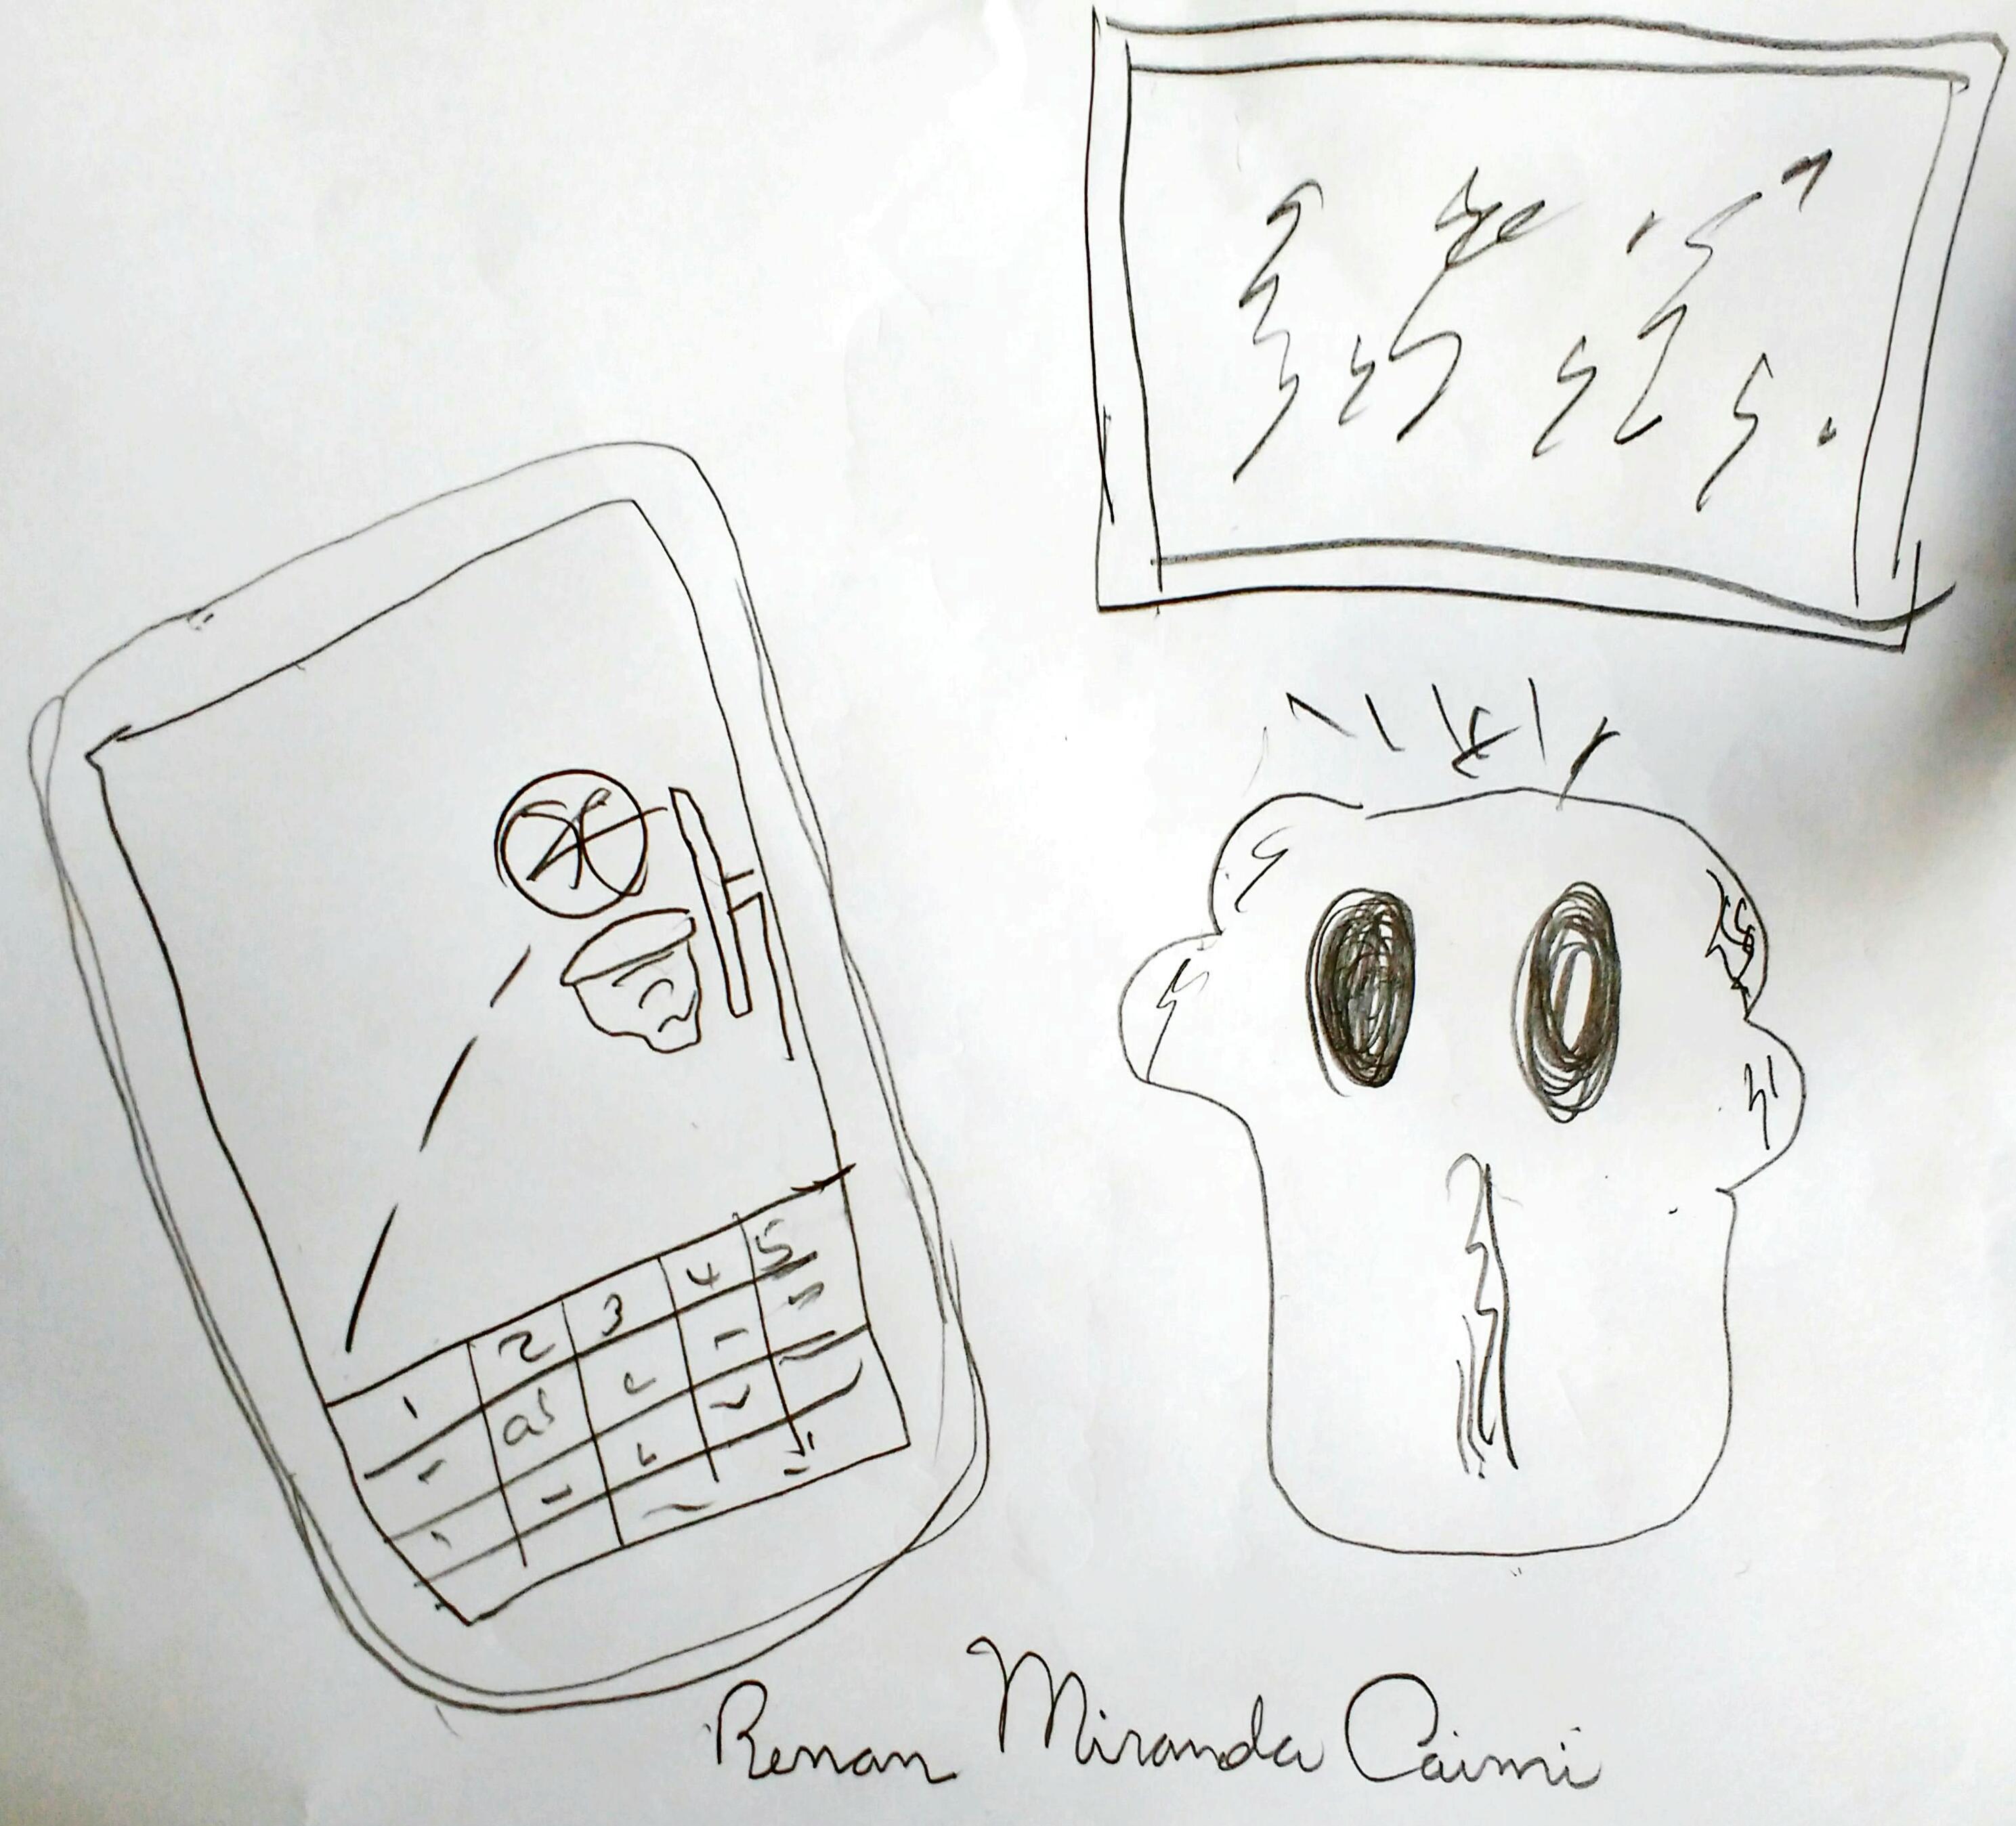 Renan Miranda Caim - Desenho - Agosto 2016